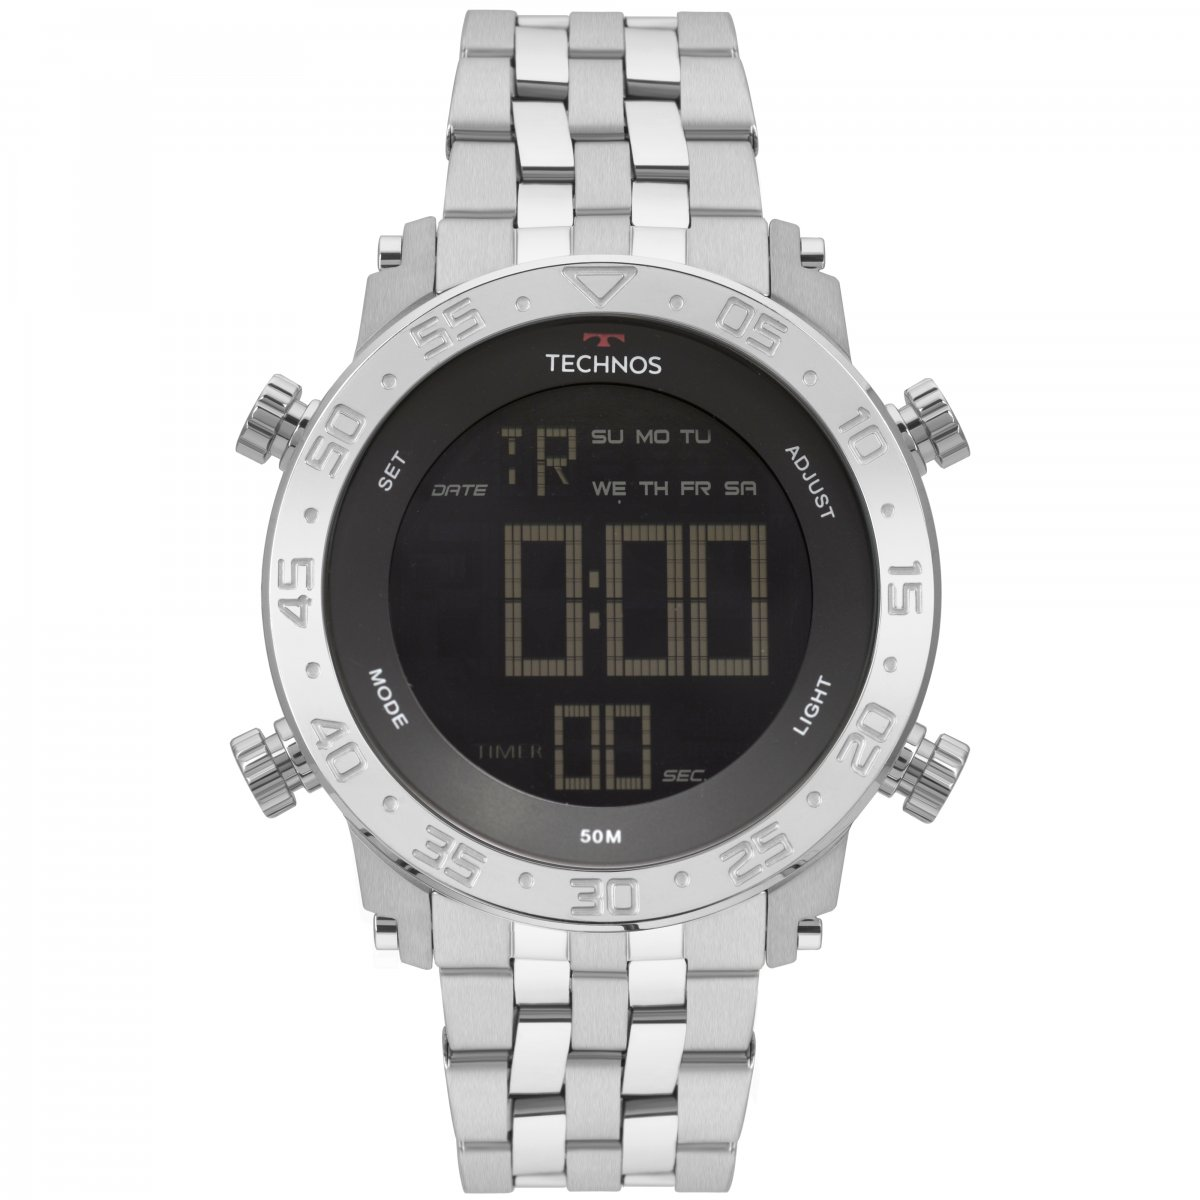 3cb75bce526a1 Relógio Technos Digital BJK006AB 1P